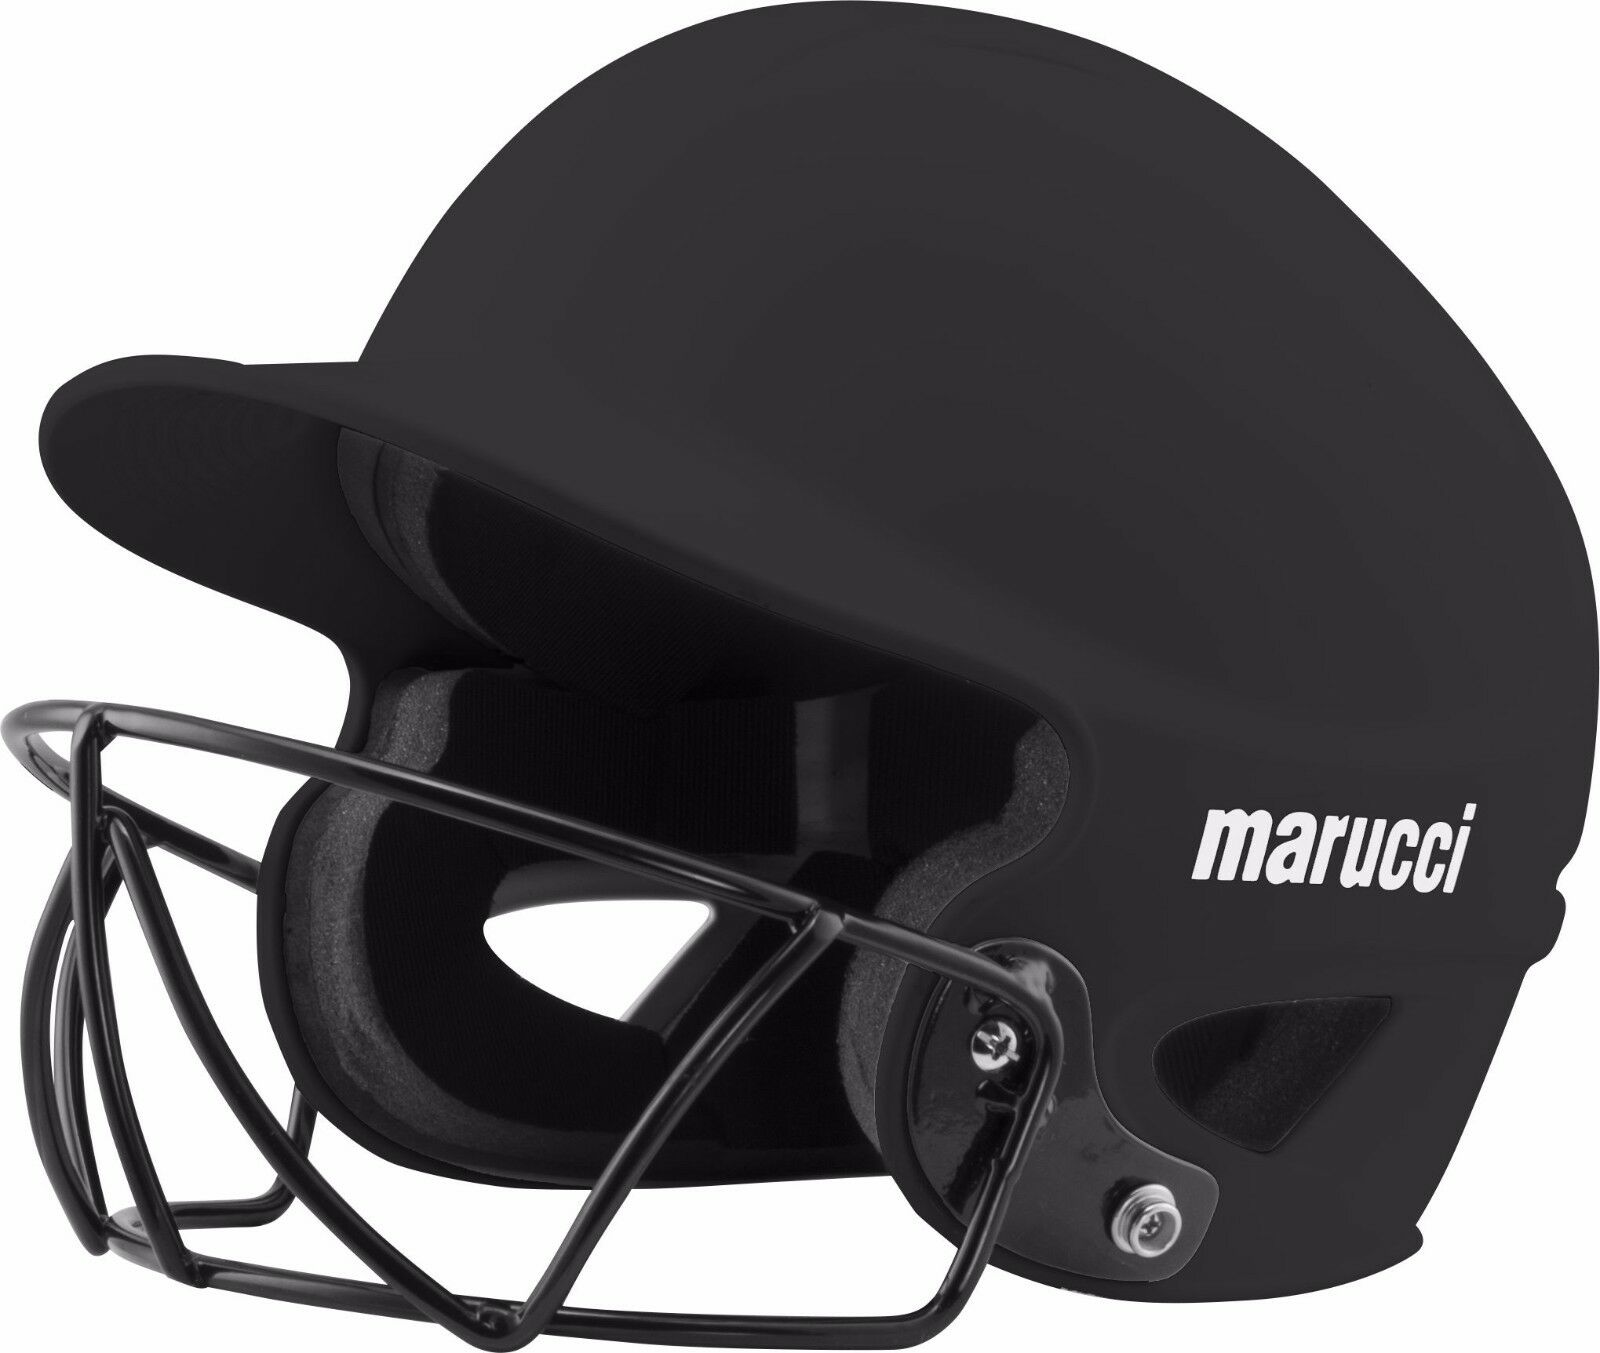 Marucci Mujer Fastpitch Softball casco de bateo mbhsb